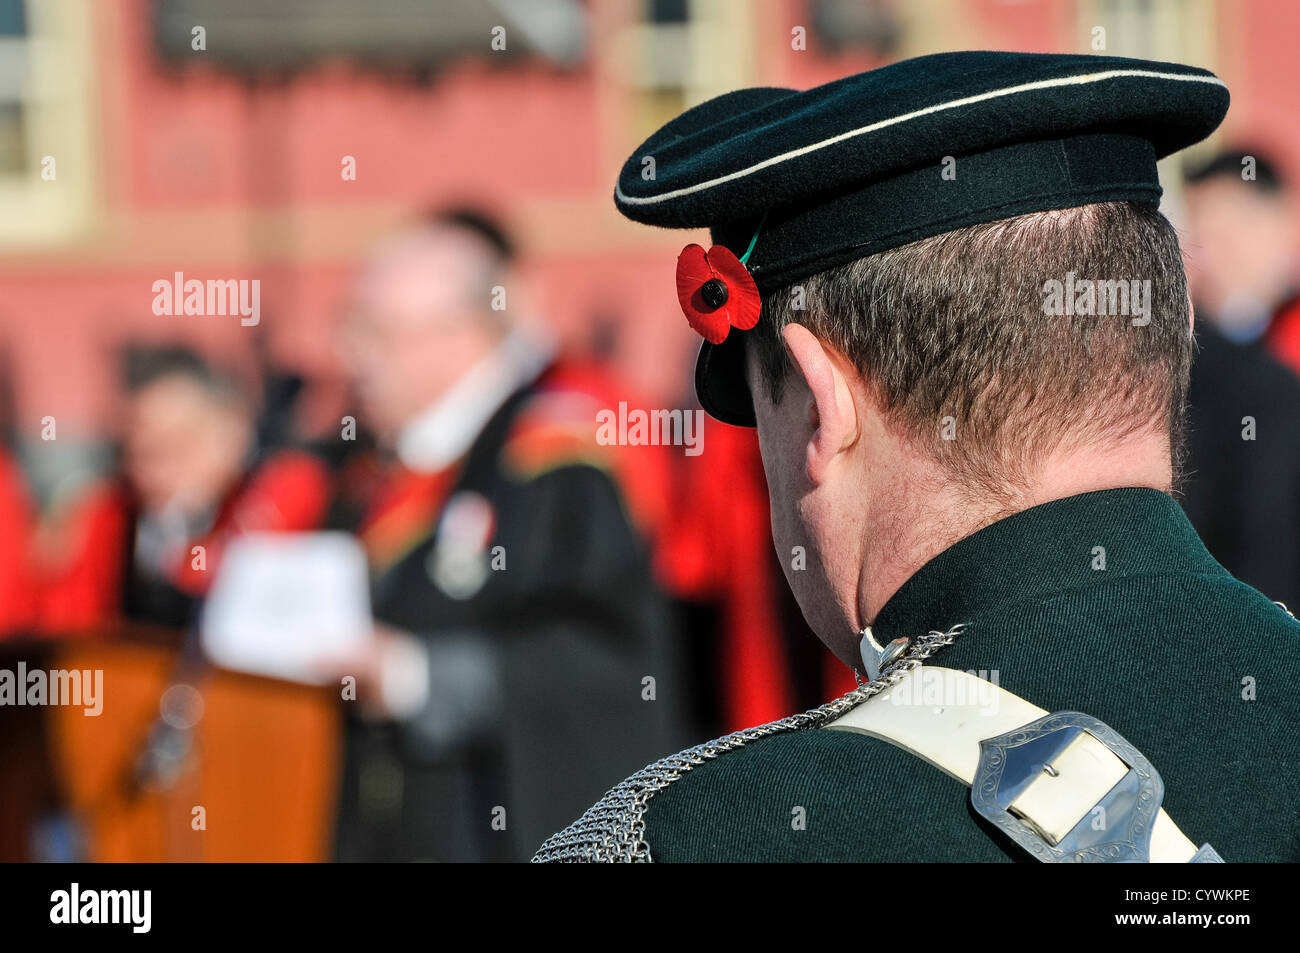 Sunday 11th November 2012, Carrickfergus, Northern Ireland.  Members of the Royal British Legion, serving armed - Stock Image